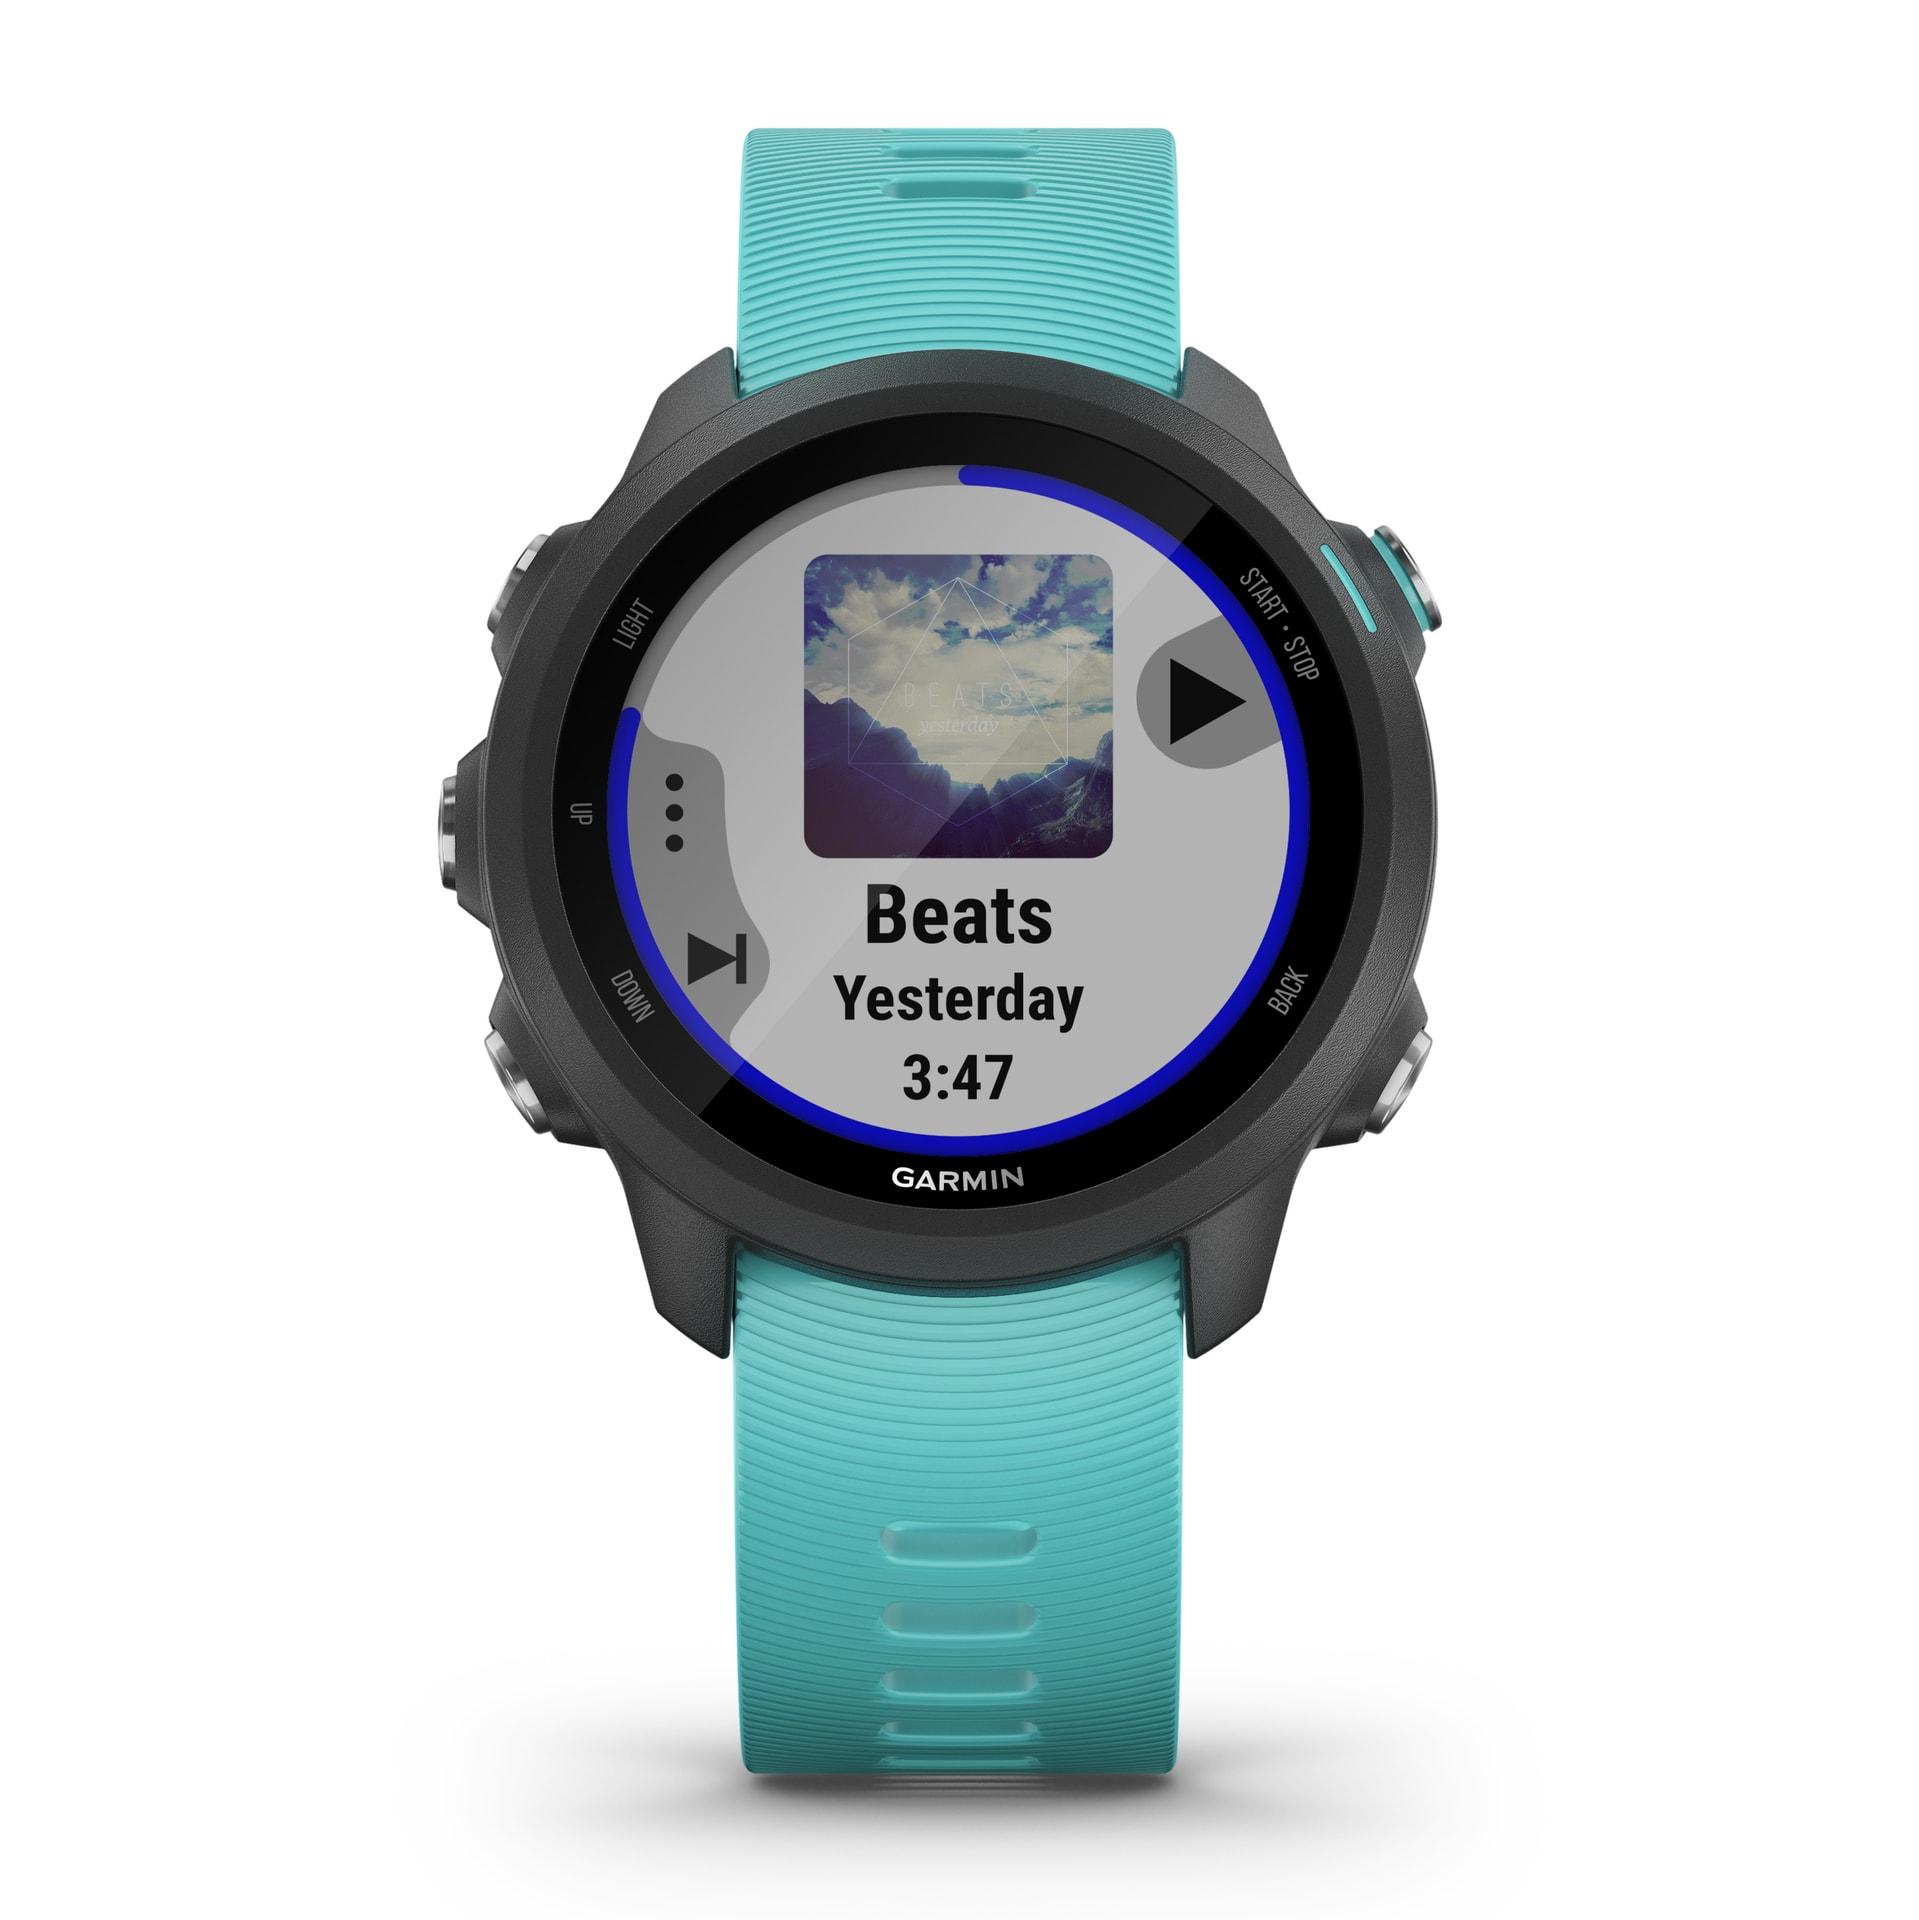 Garmin Forerunner fitness watches get huge refresh: All 5 detailed